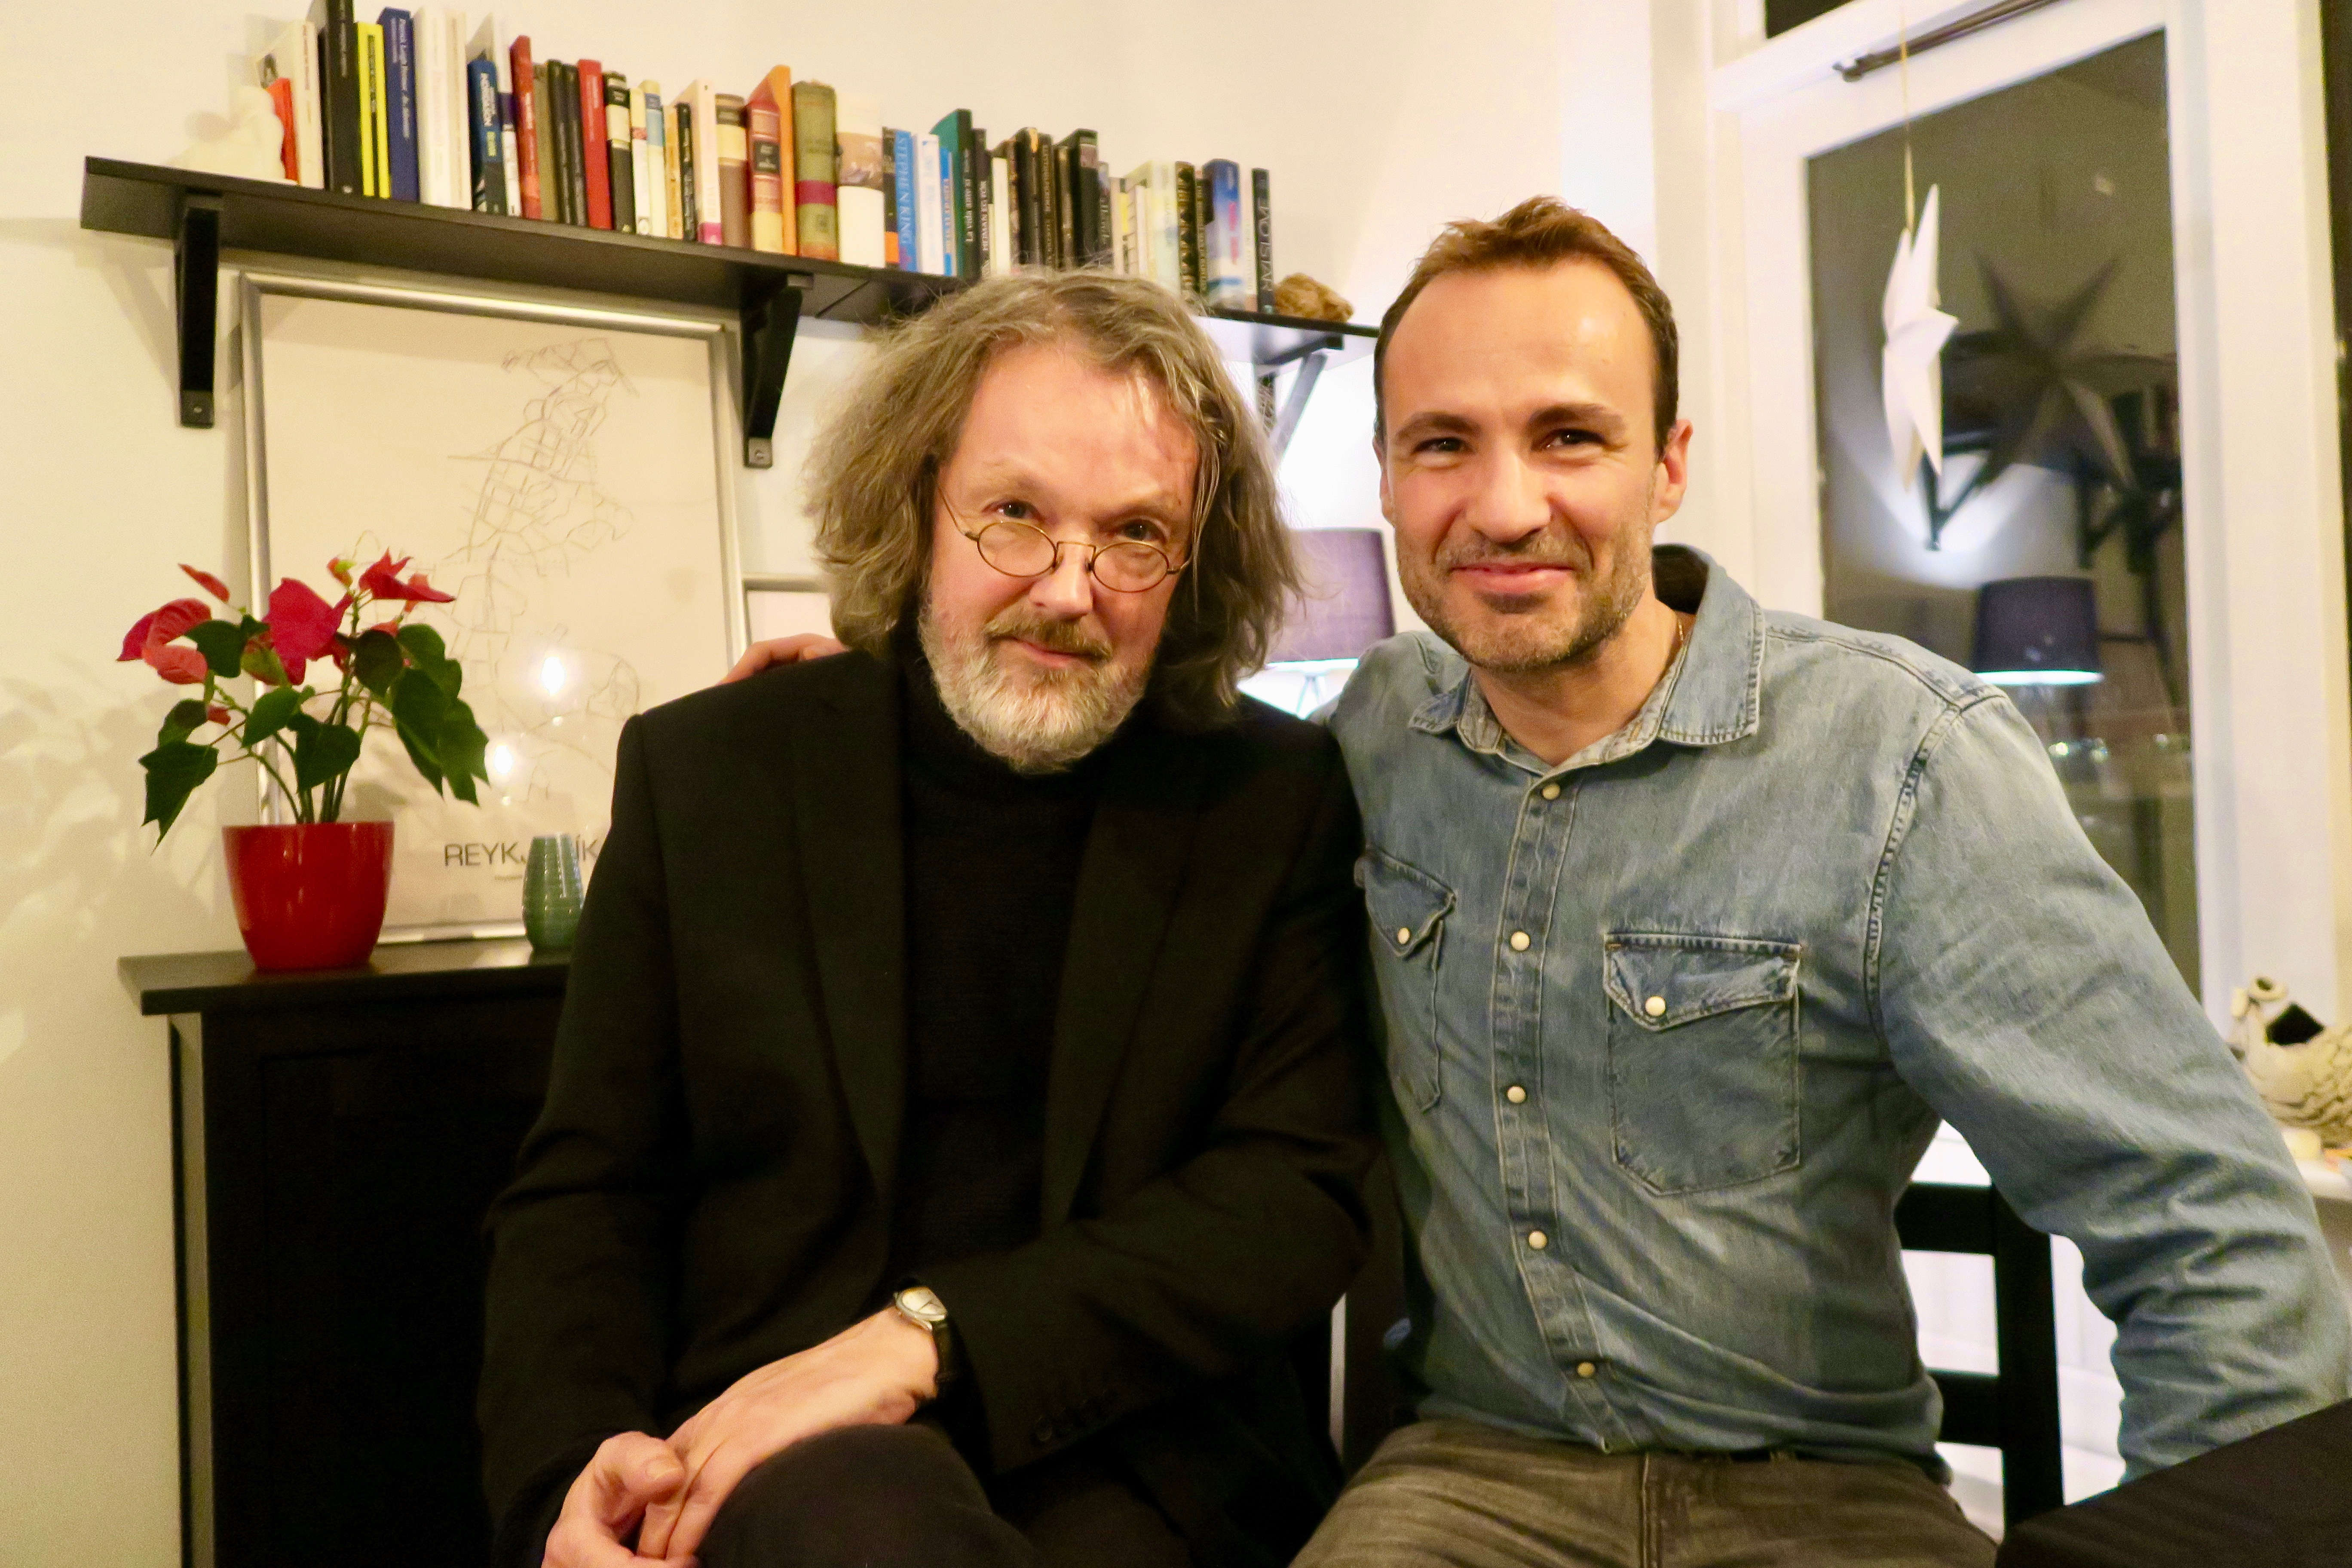 Arni Thorarinsson interview English with Jordi Pujolà Spanish writer in Iceland